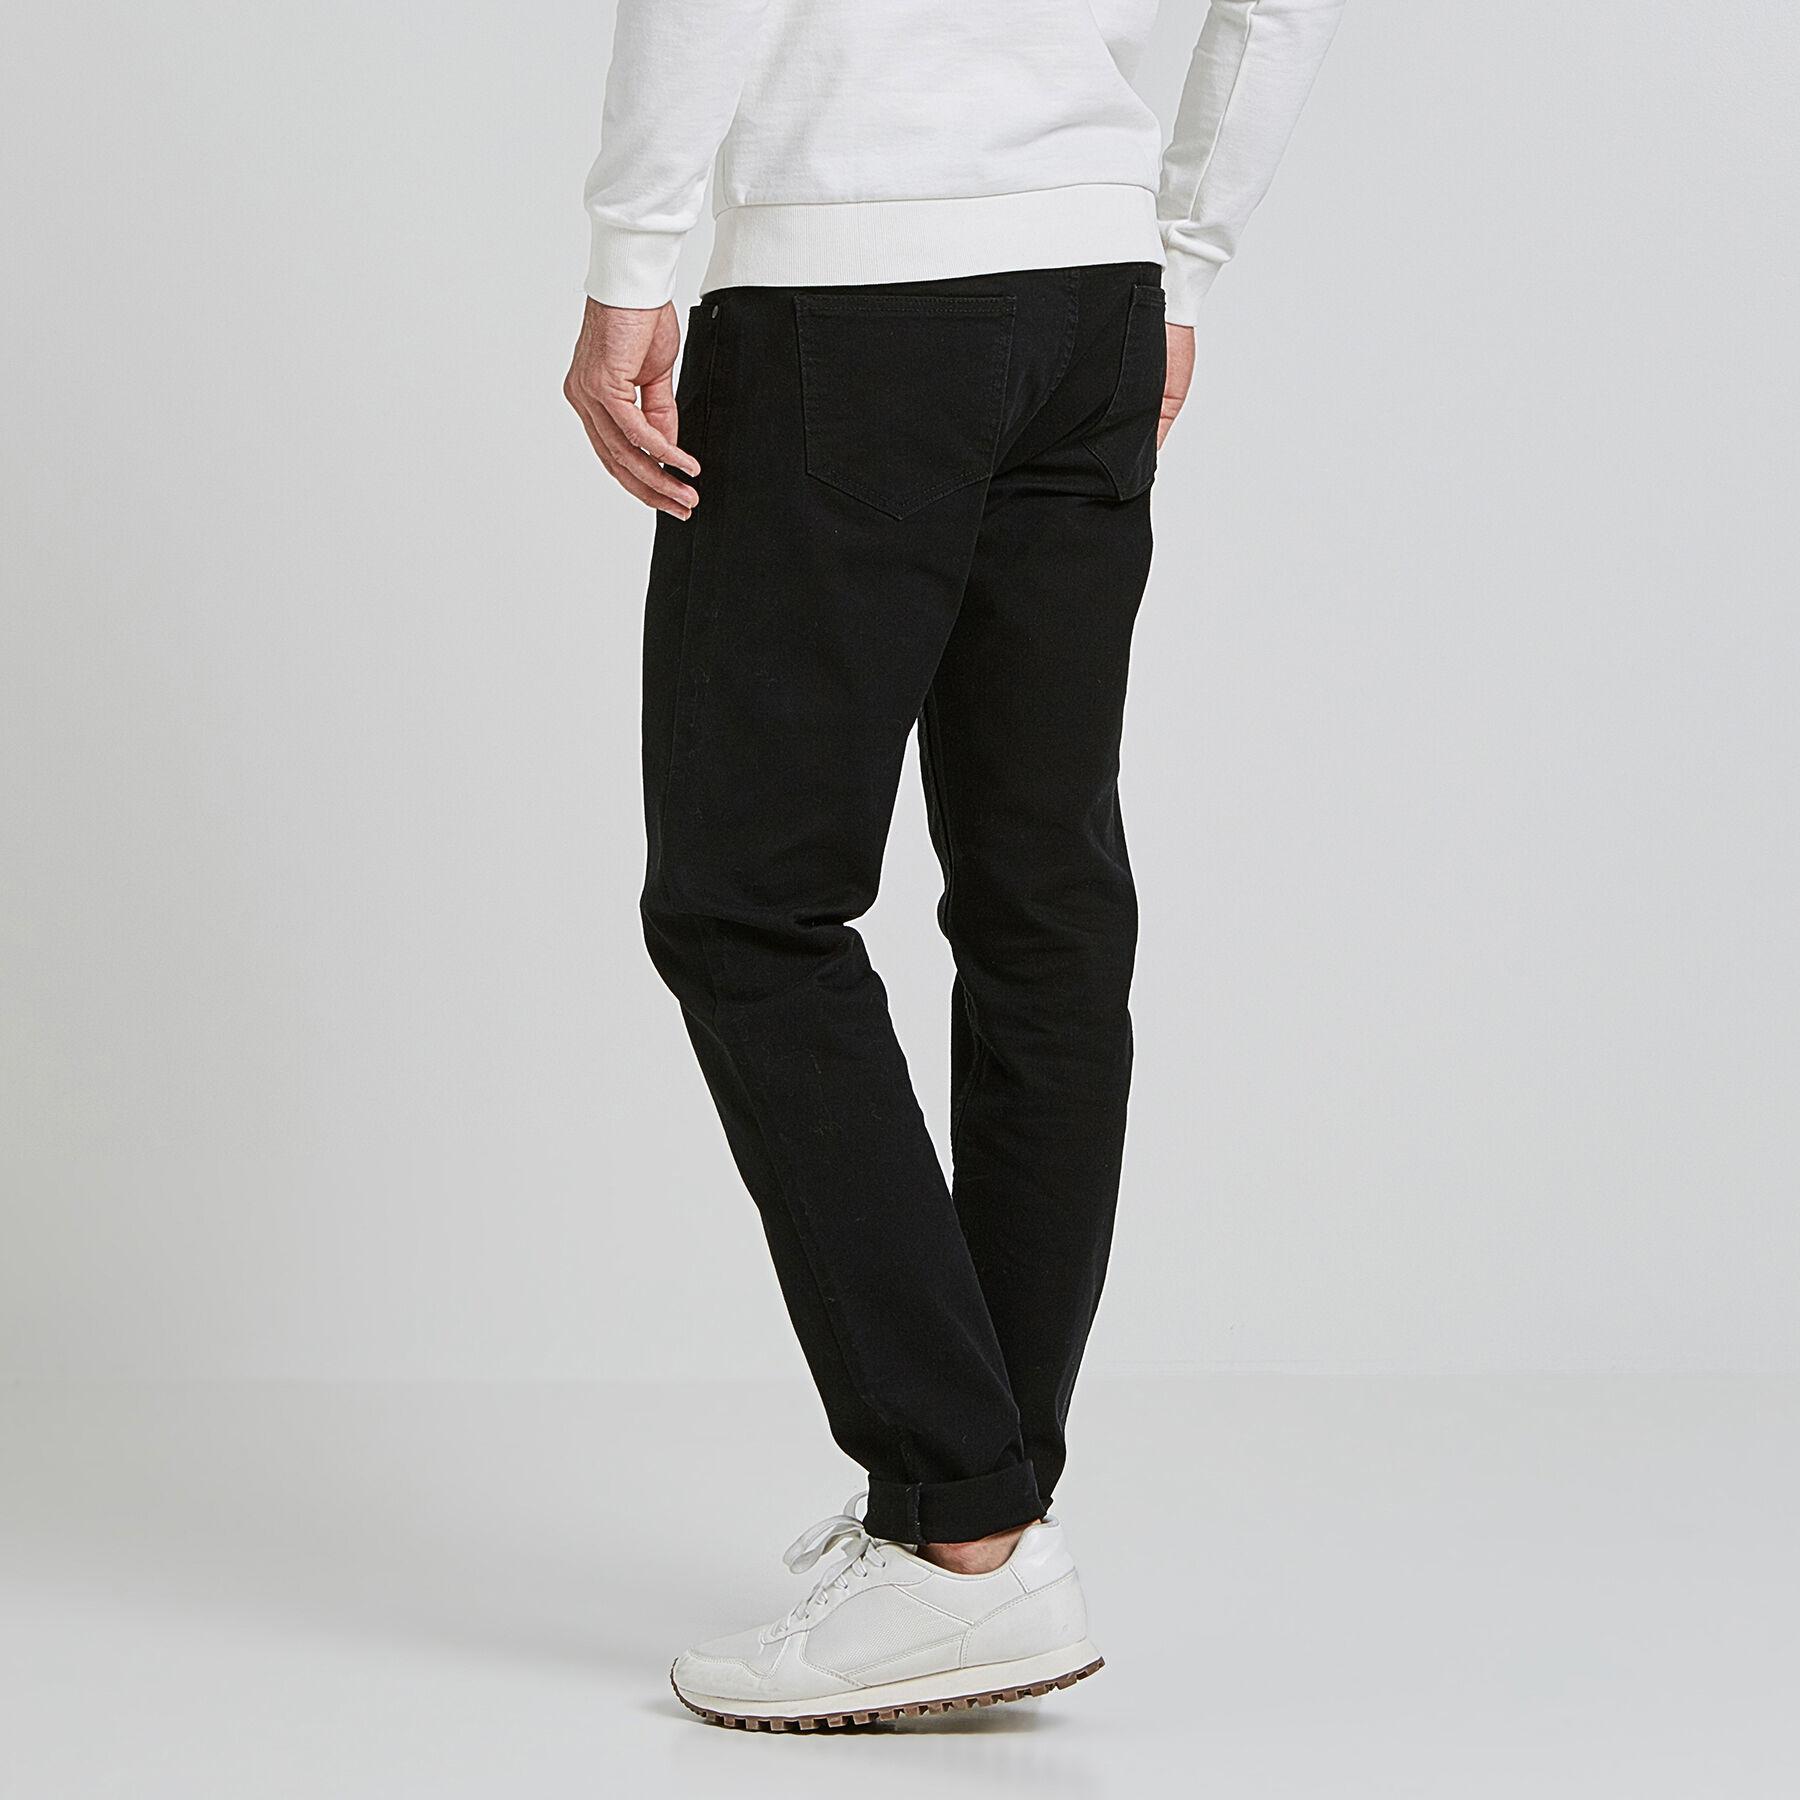 pantalon slim 5 poches noir homme jules. Black Bedroom Furniture Sets. Home Design Ideas